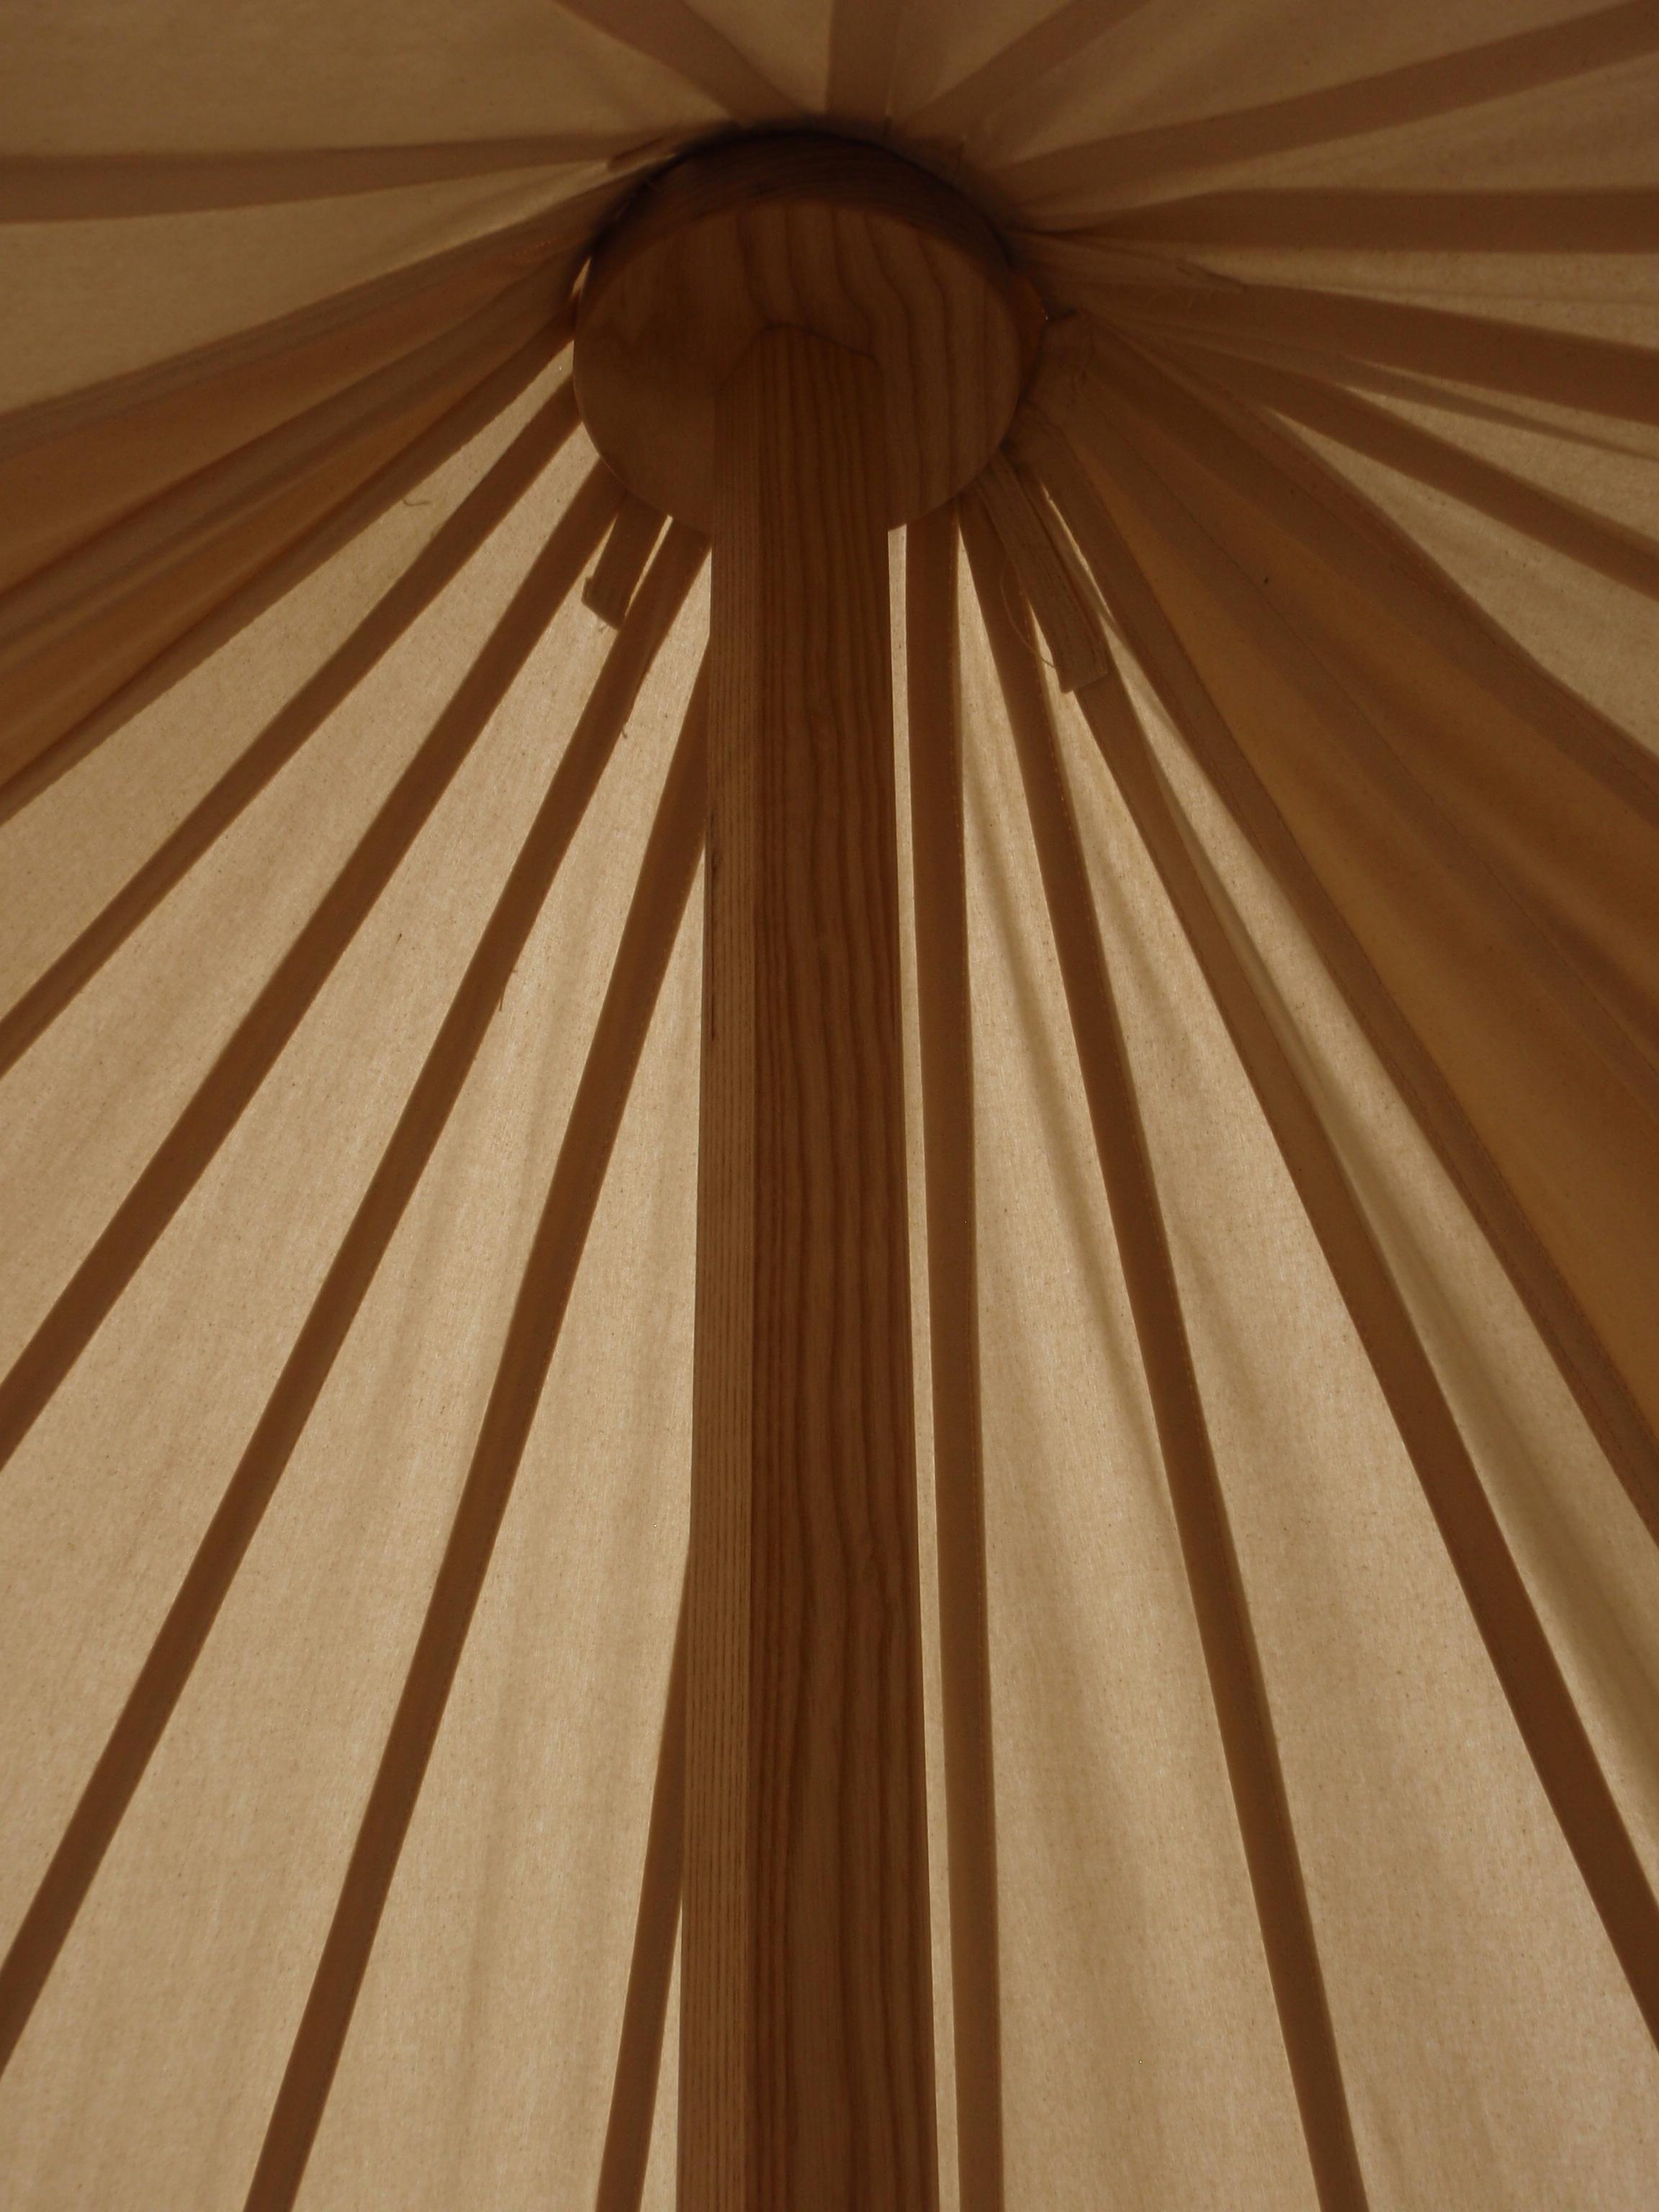 Fritz Wilhelm Llc 187 Conical Tent